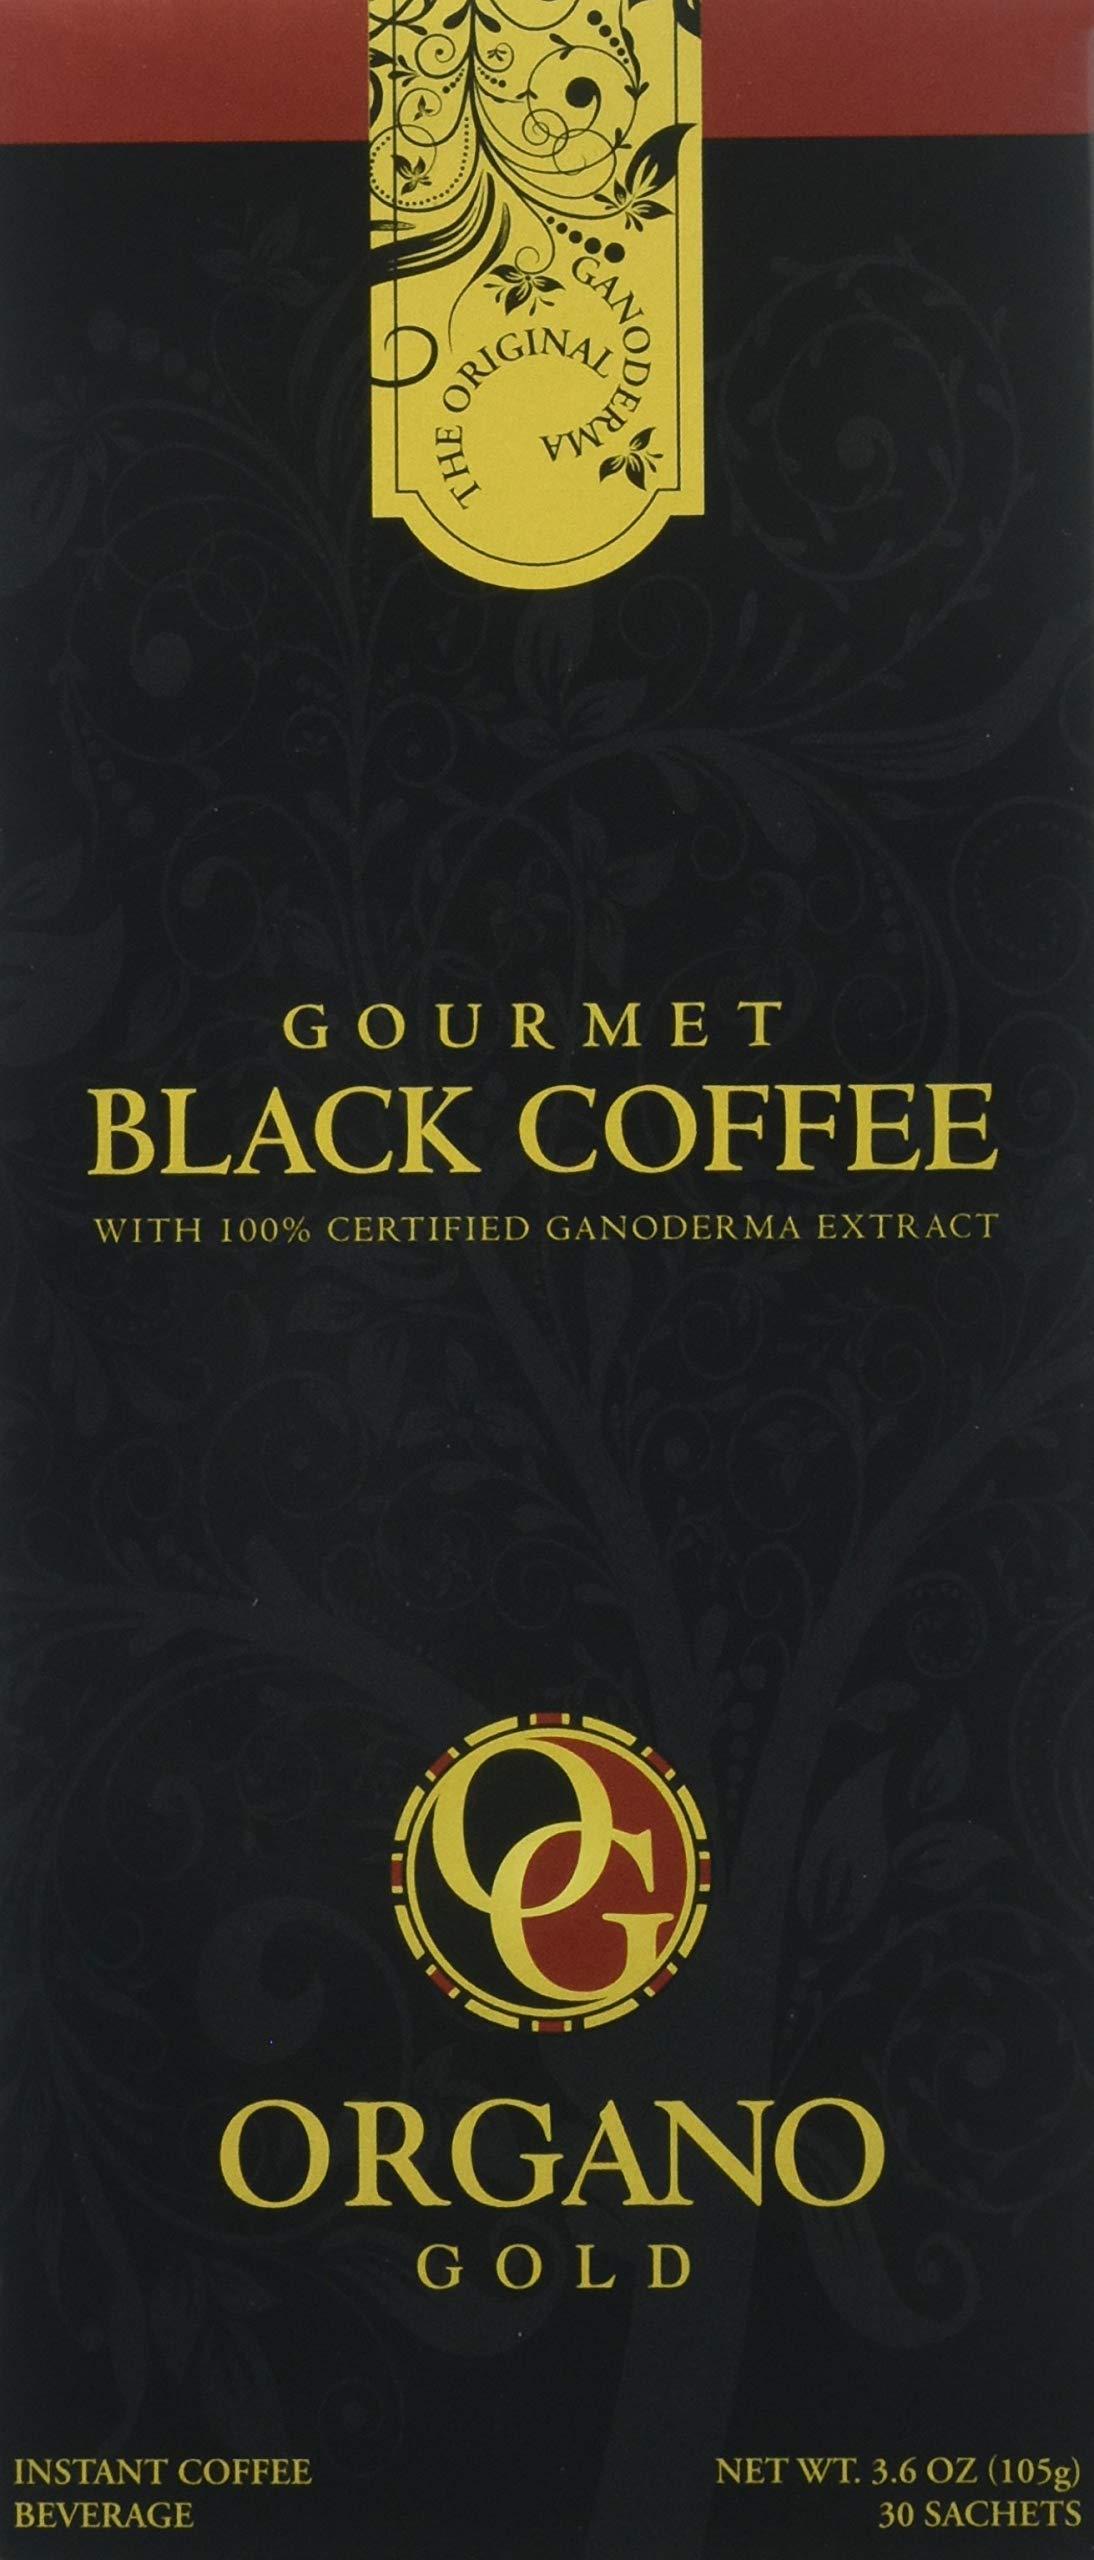 2 Box Organo Gold Gourmet Black Coffee, Organic 100% Certified, 105g - 30 bags (3.5g)